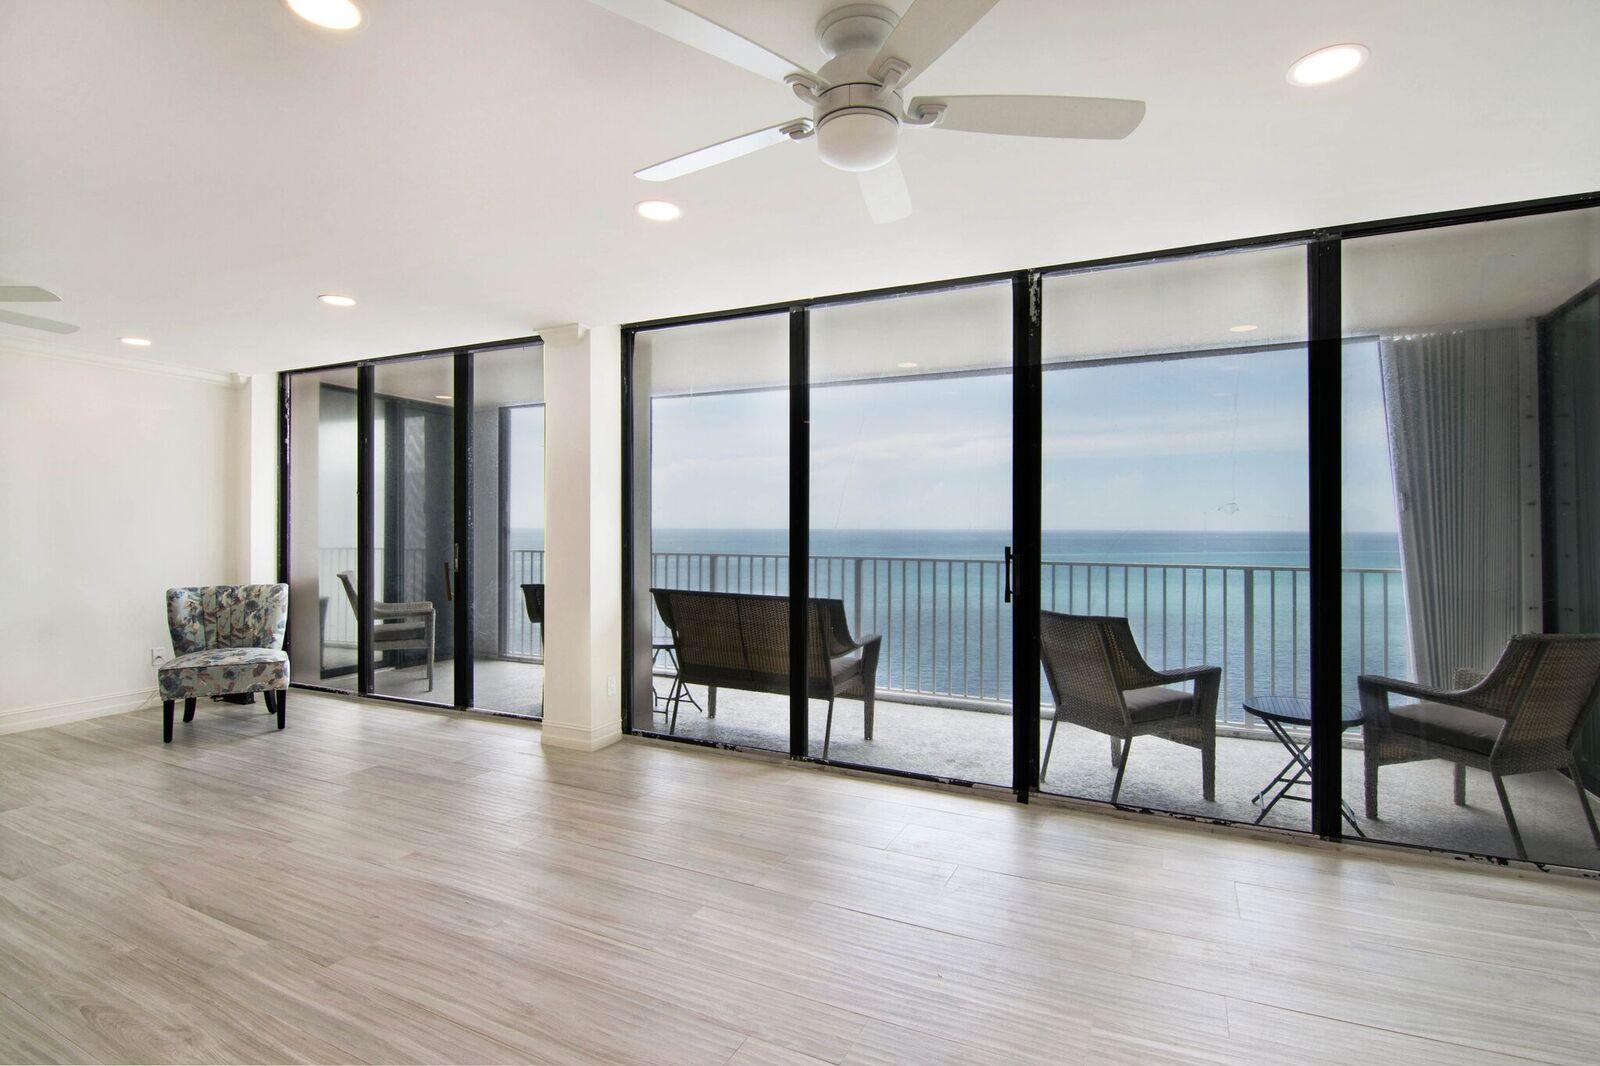 Padron Flooring And Design Center